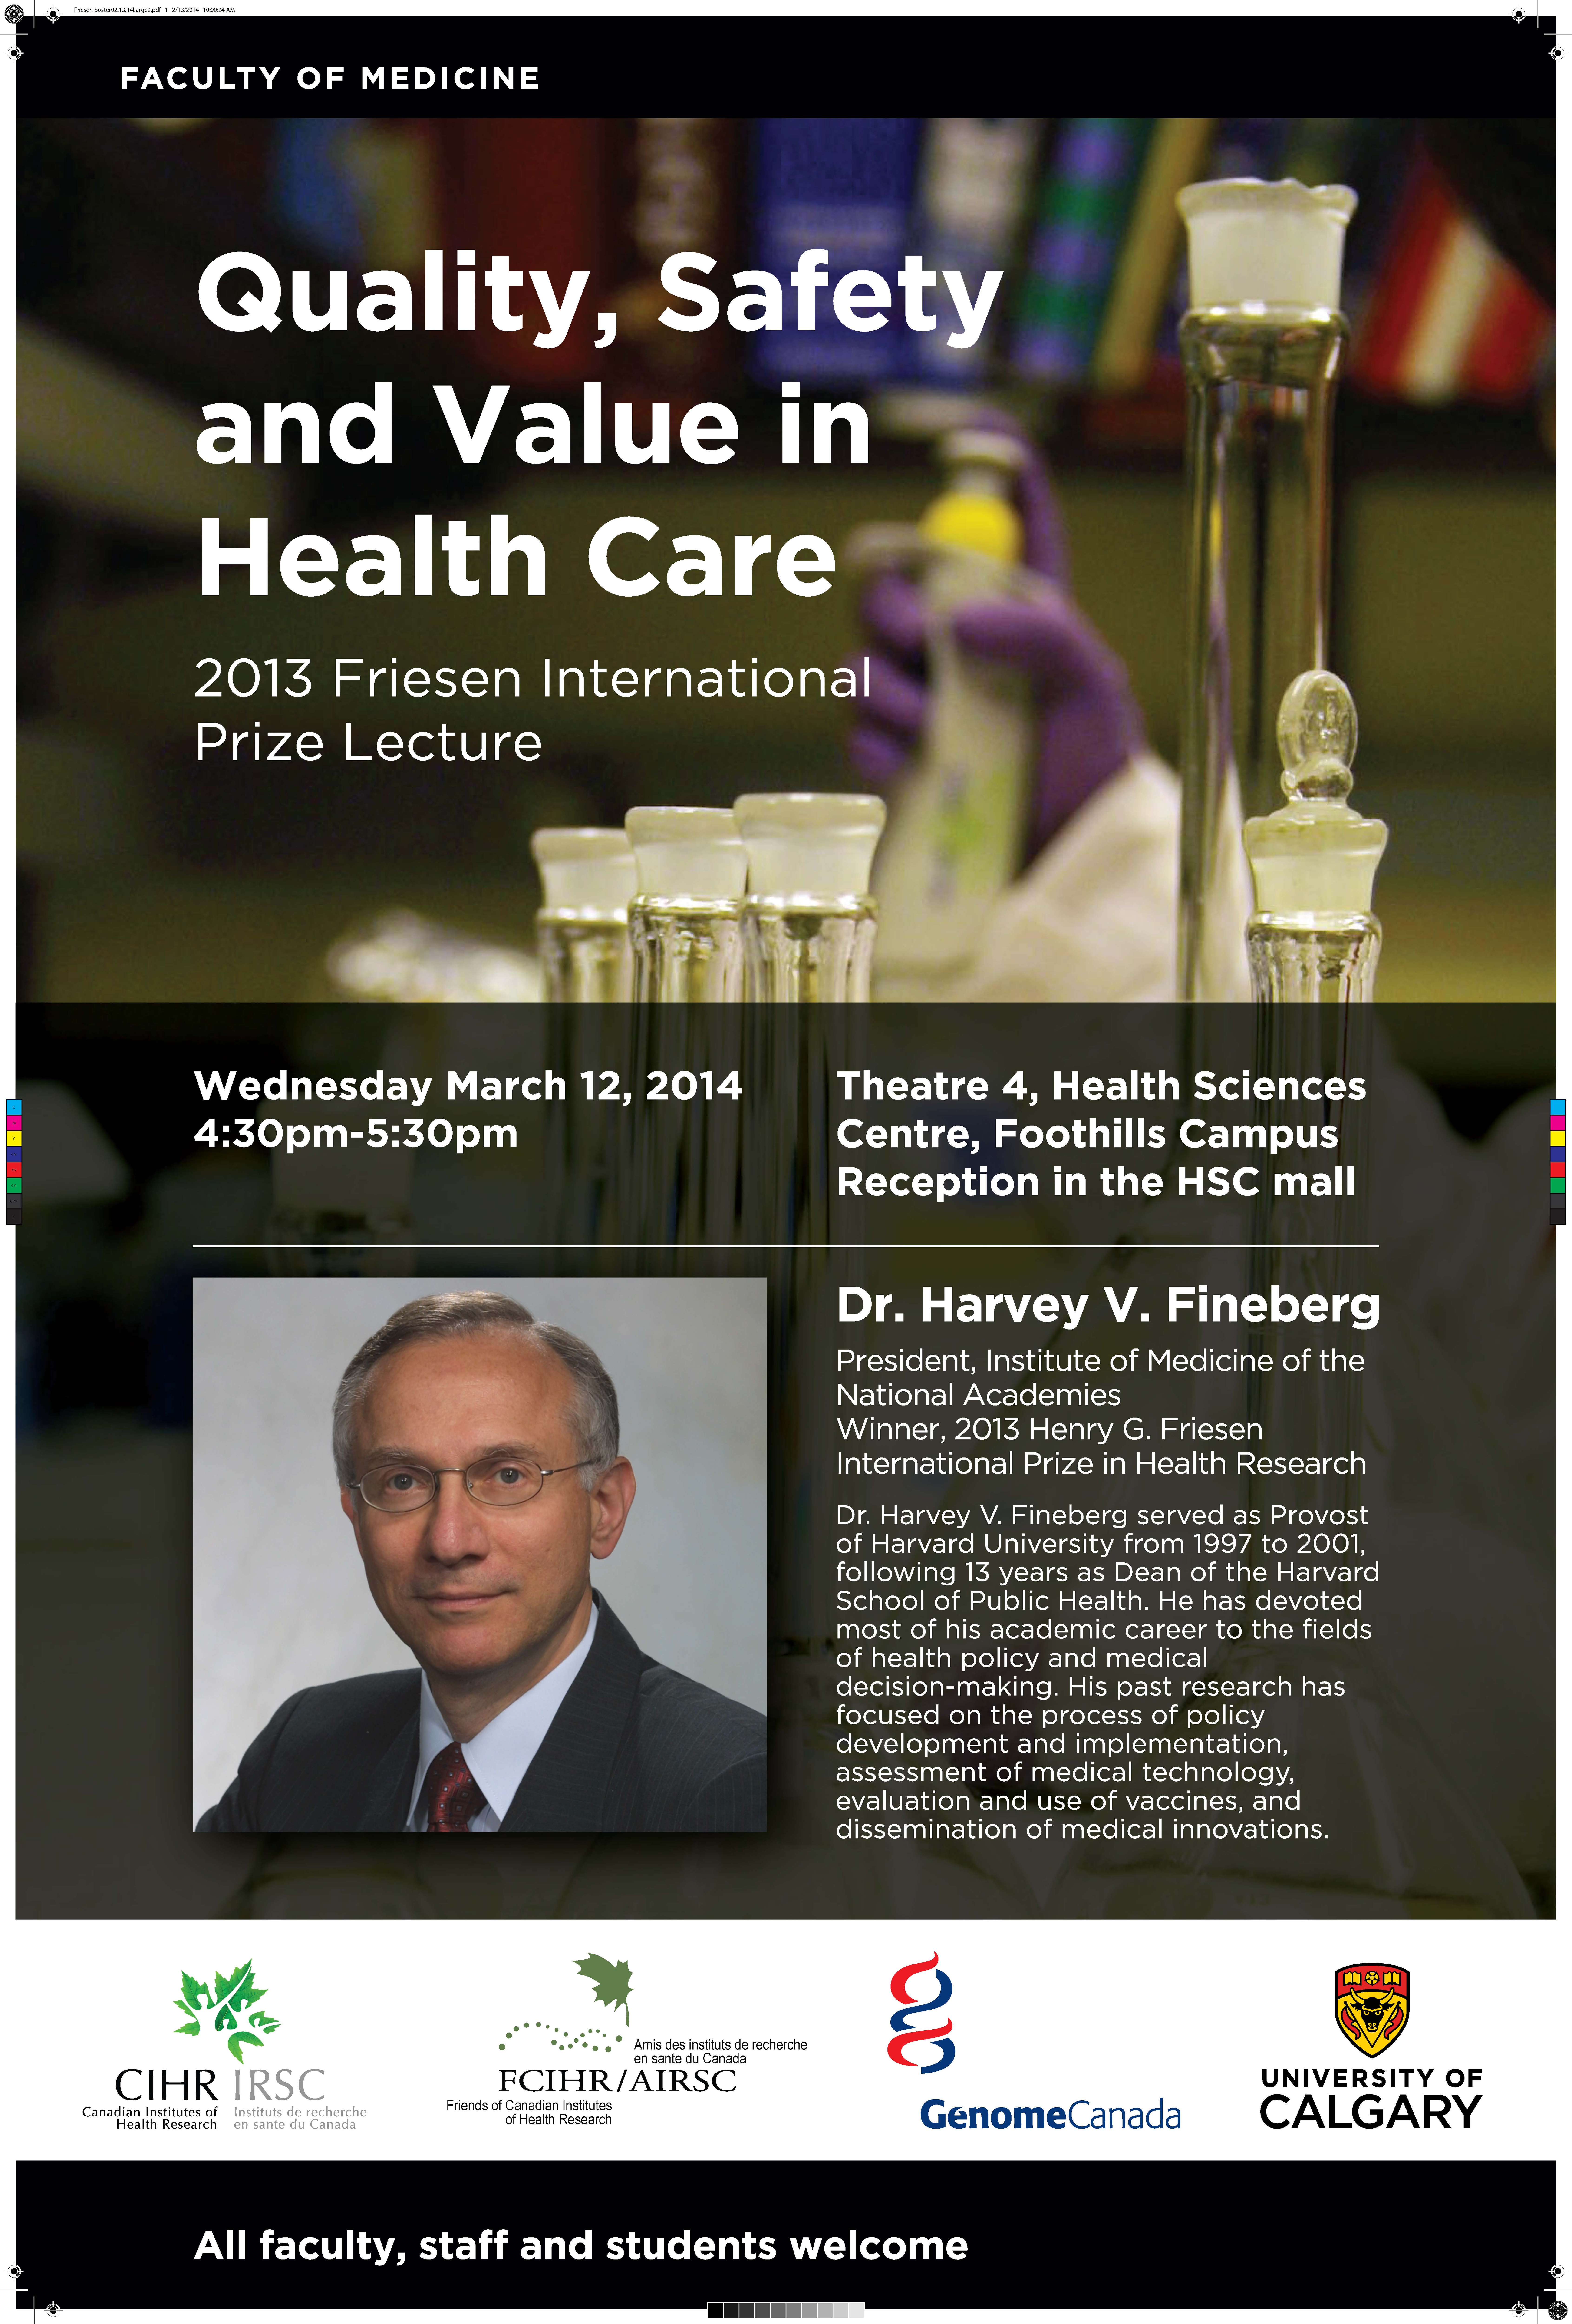 U Calgary - Institutional visit - Fineberg - March 11-12, 2014